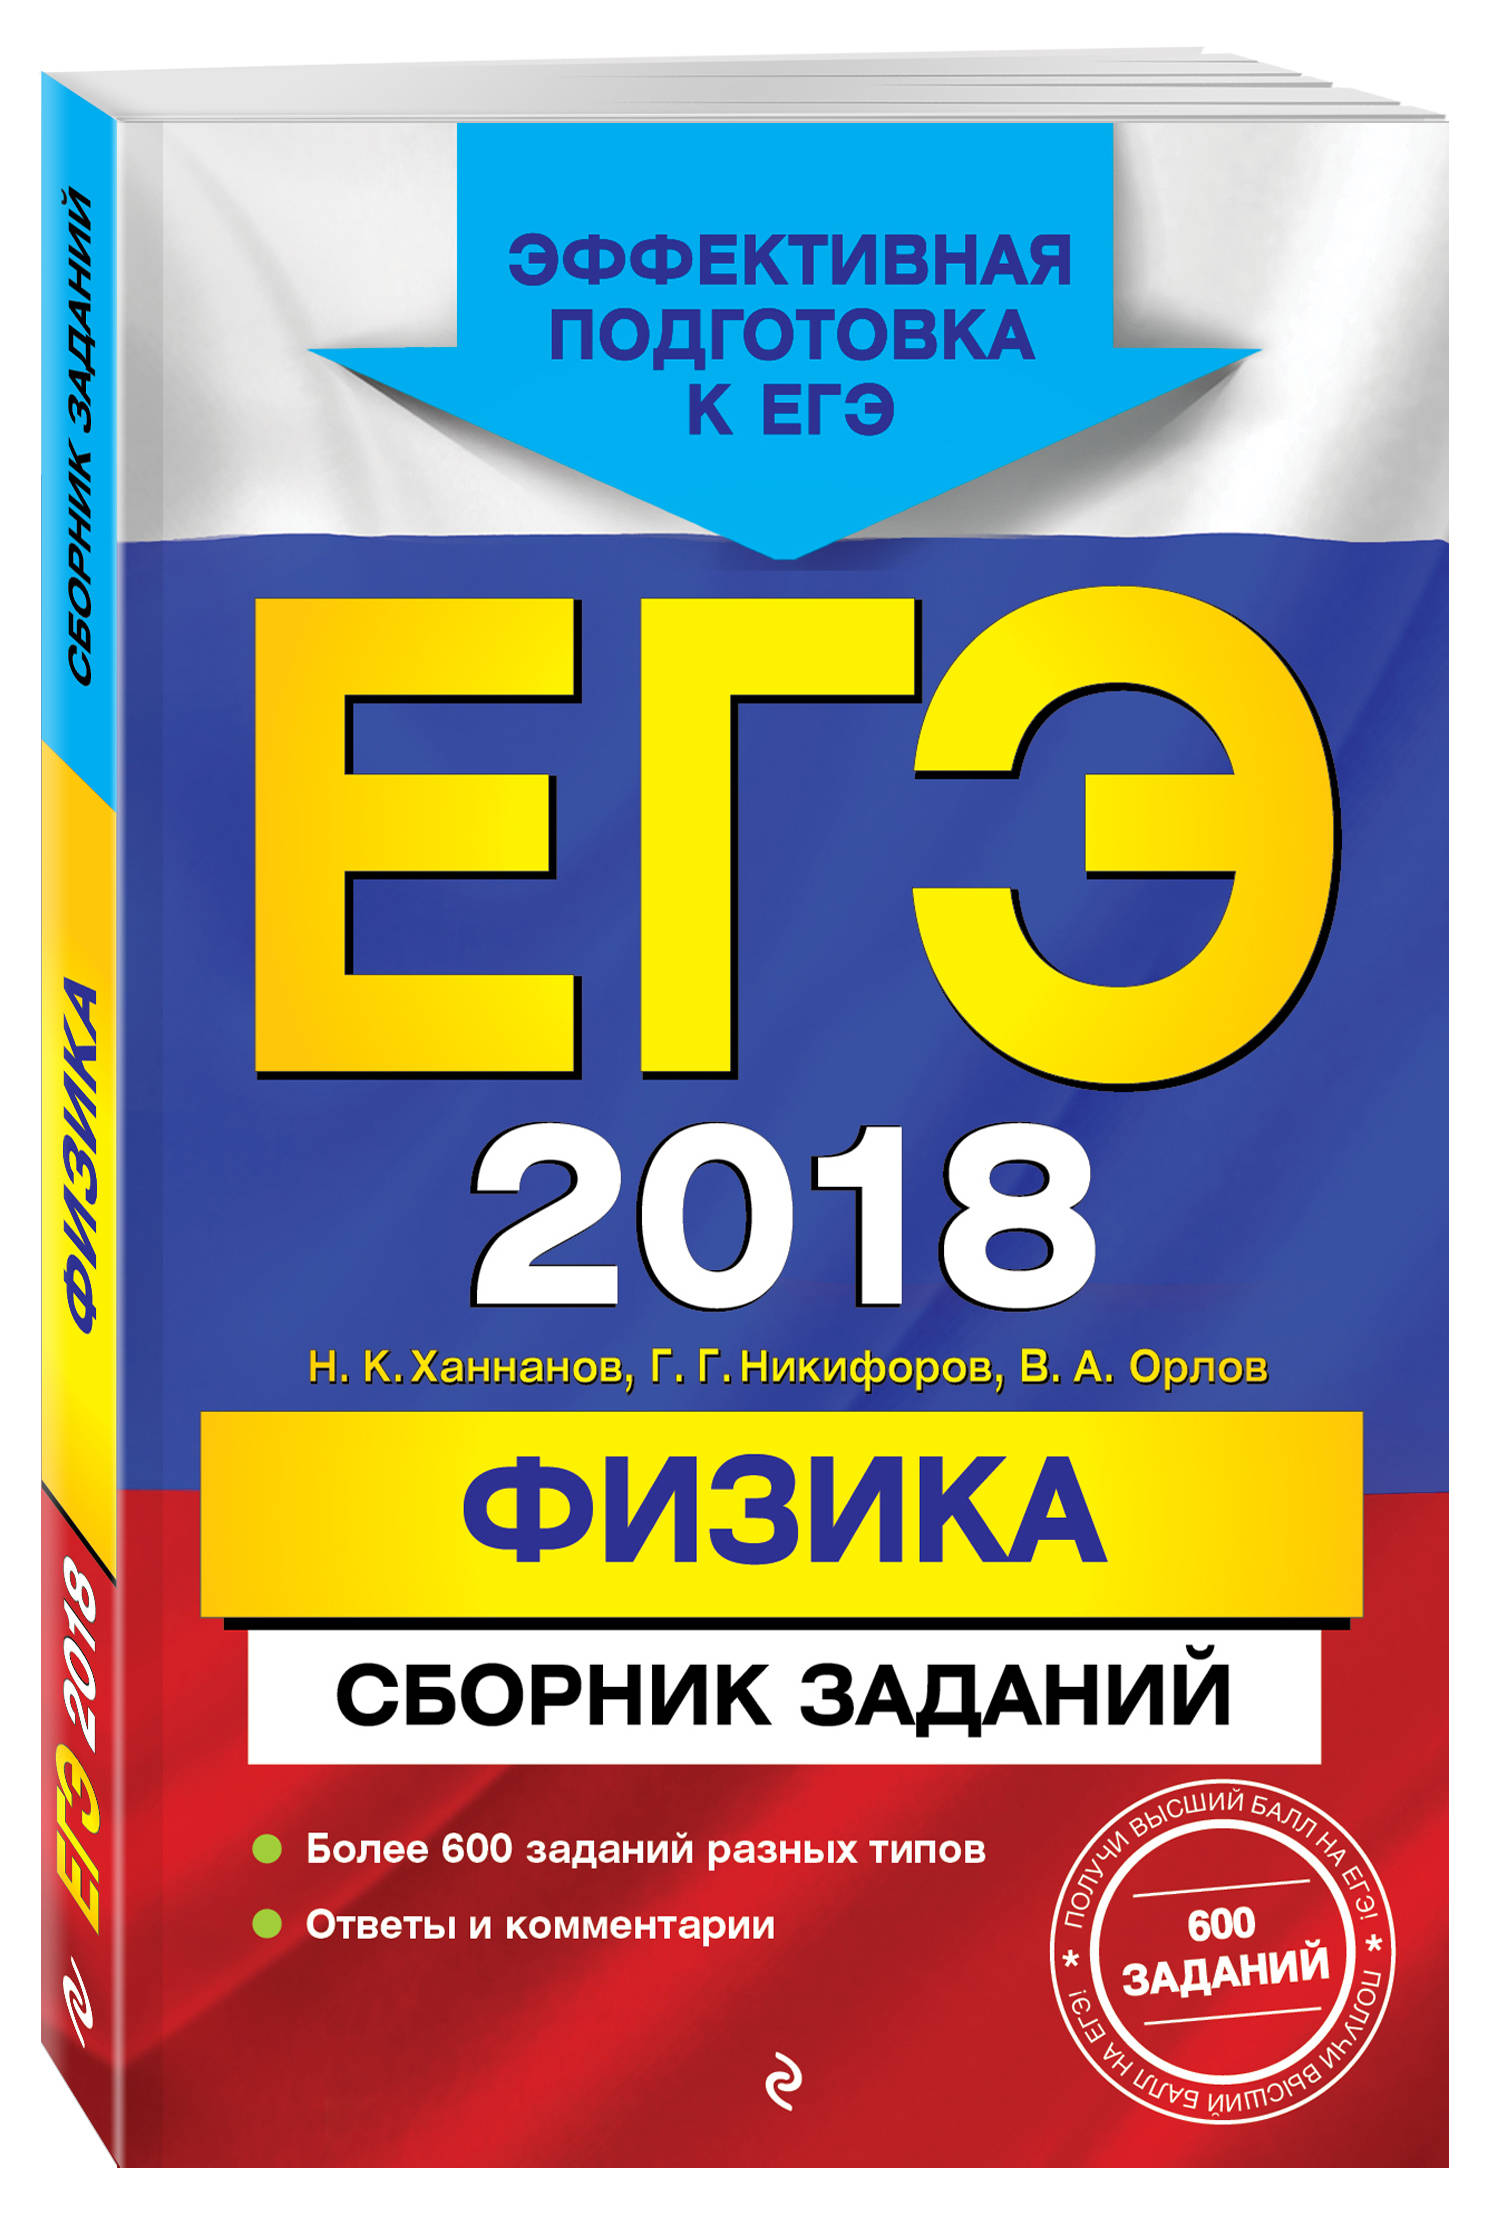 ЕГЭ-2018. Физика. Сборник заданий от book24.ru